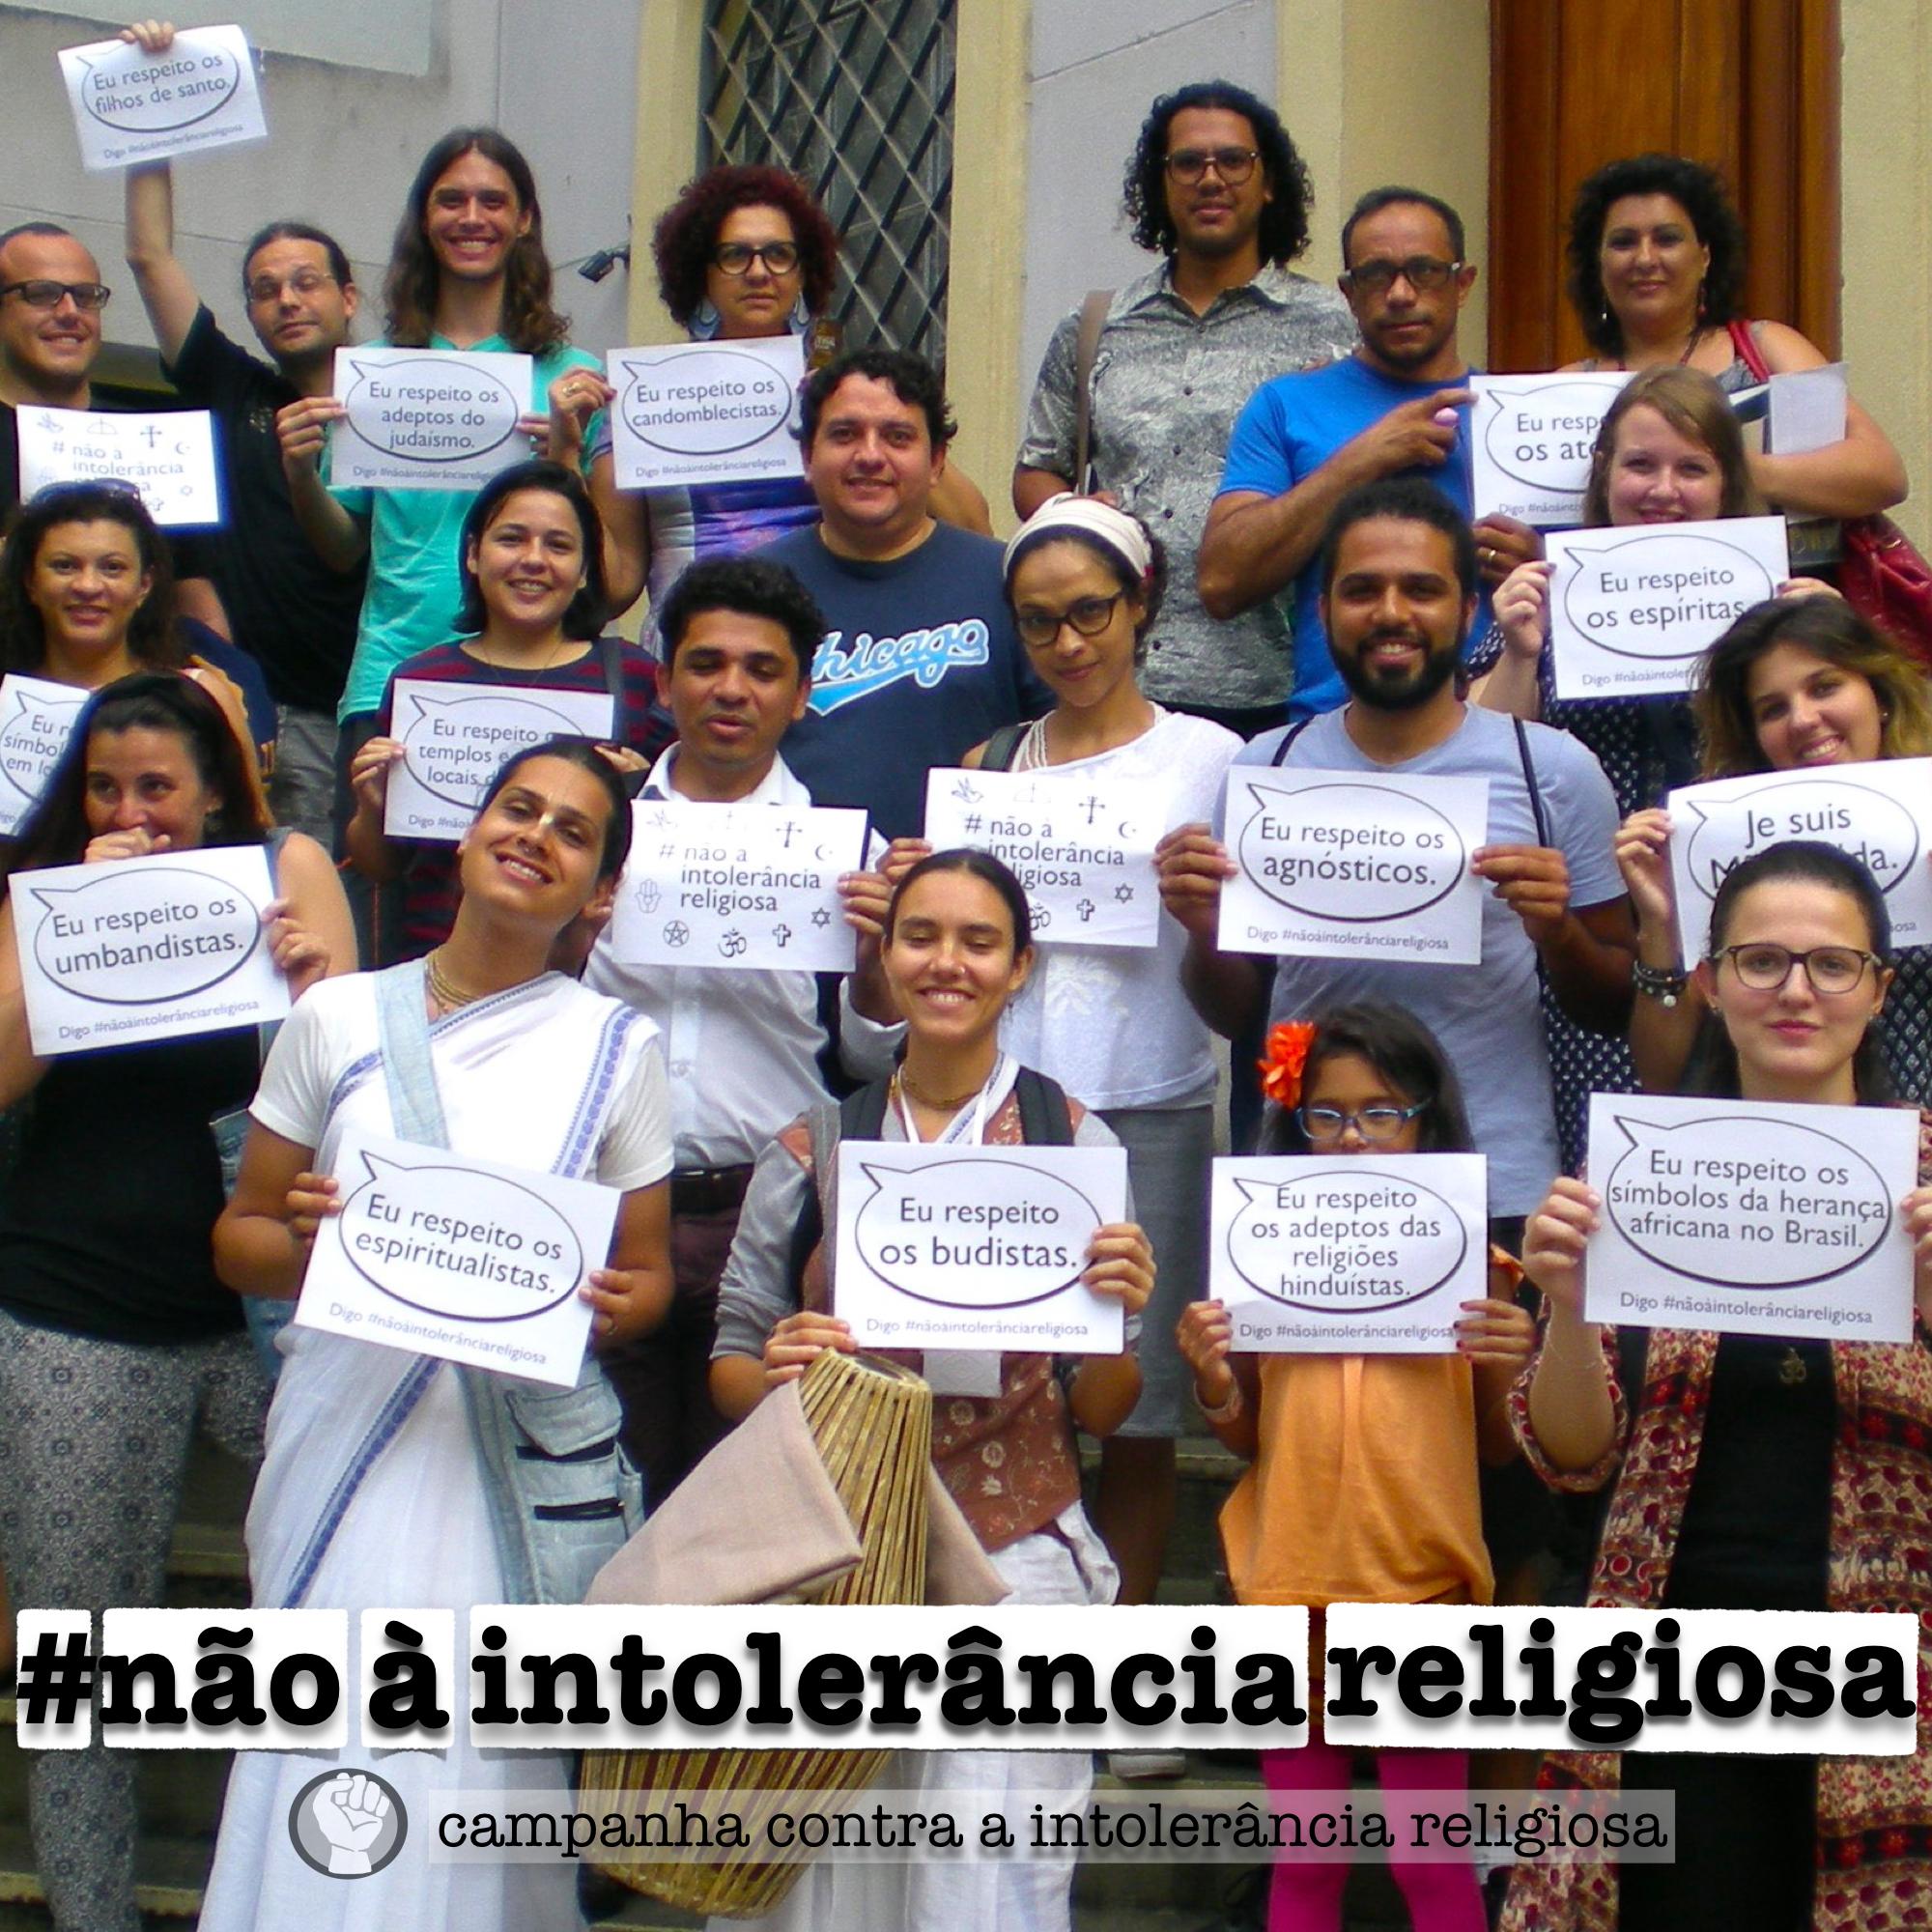 2019_campanha-contra-a-intolerancia-religiosa-insta1.035